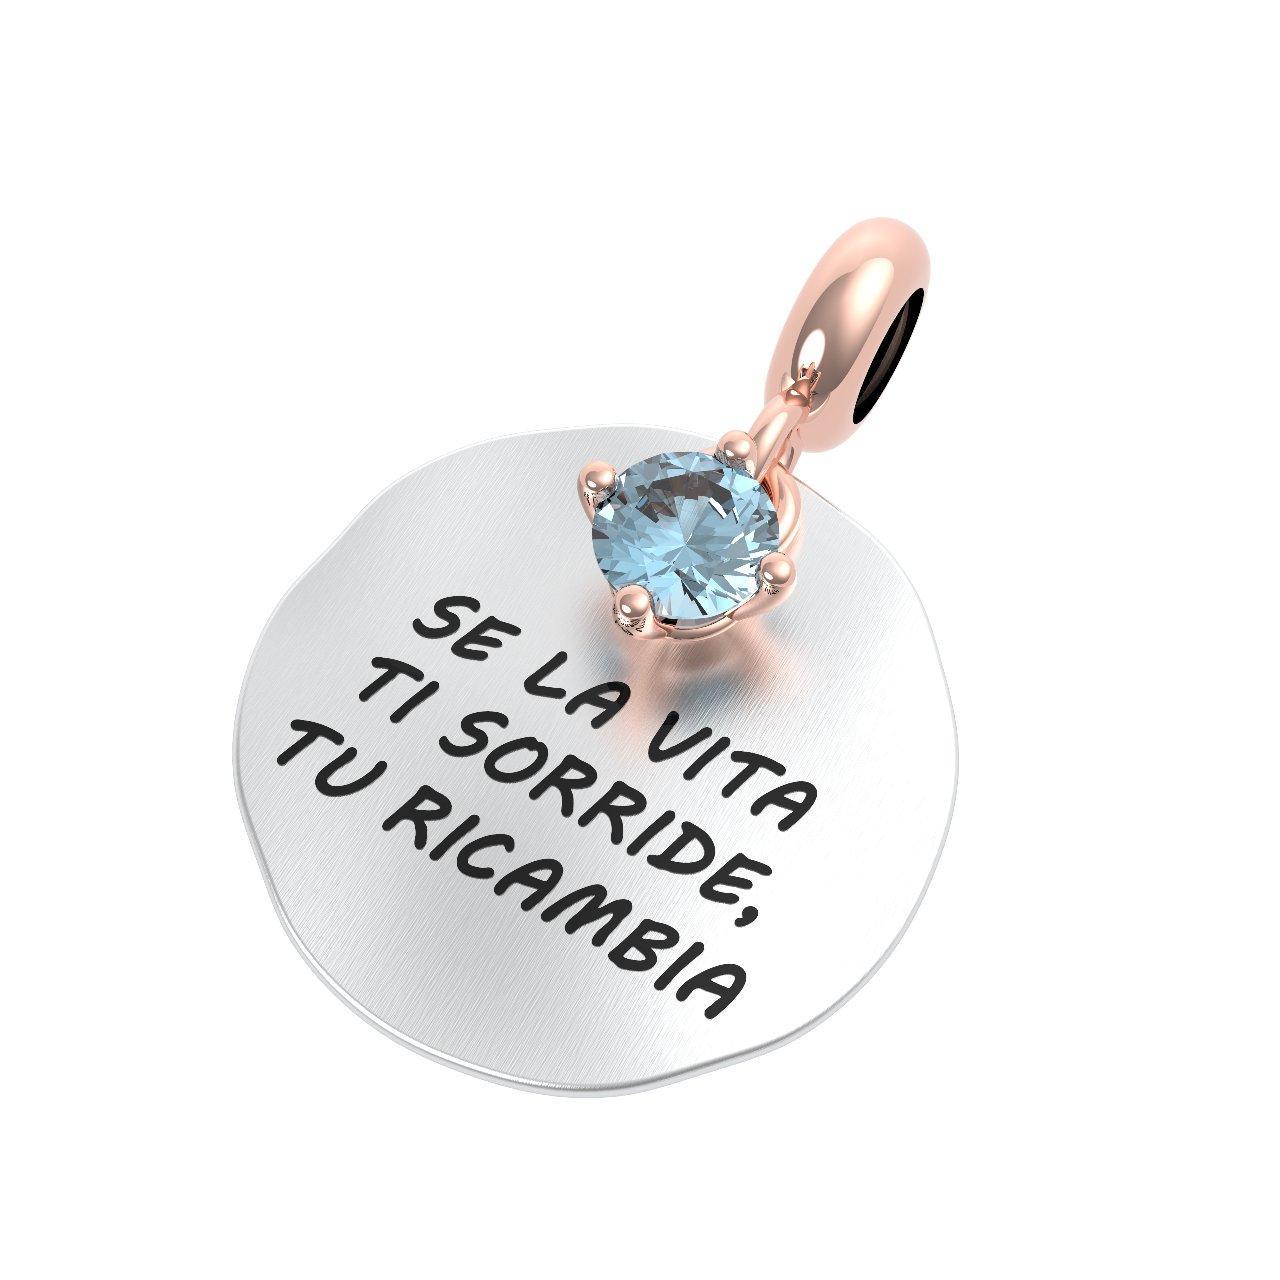 Ciondolo argento Rerum 25127 propositi